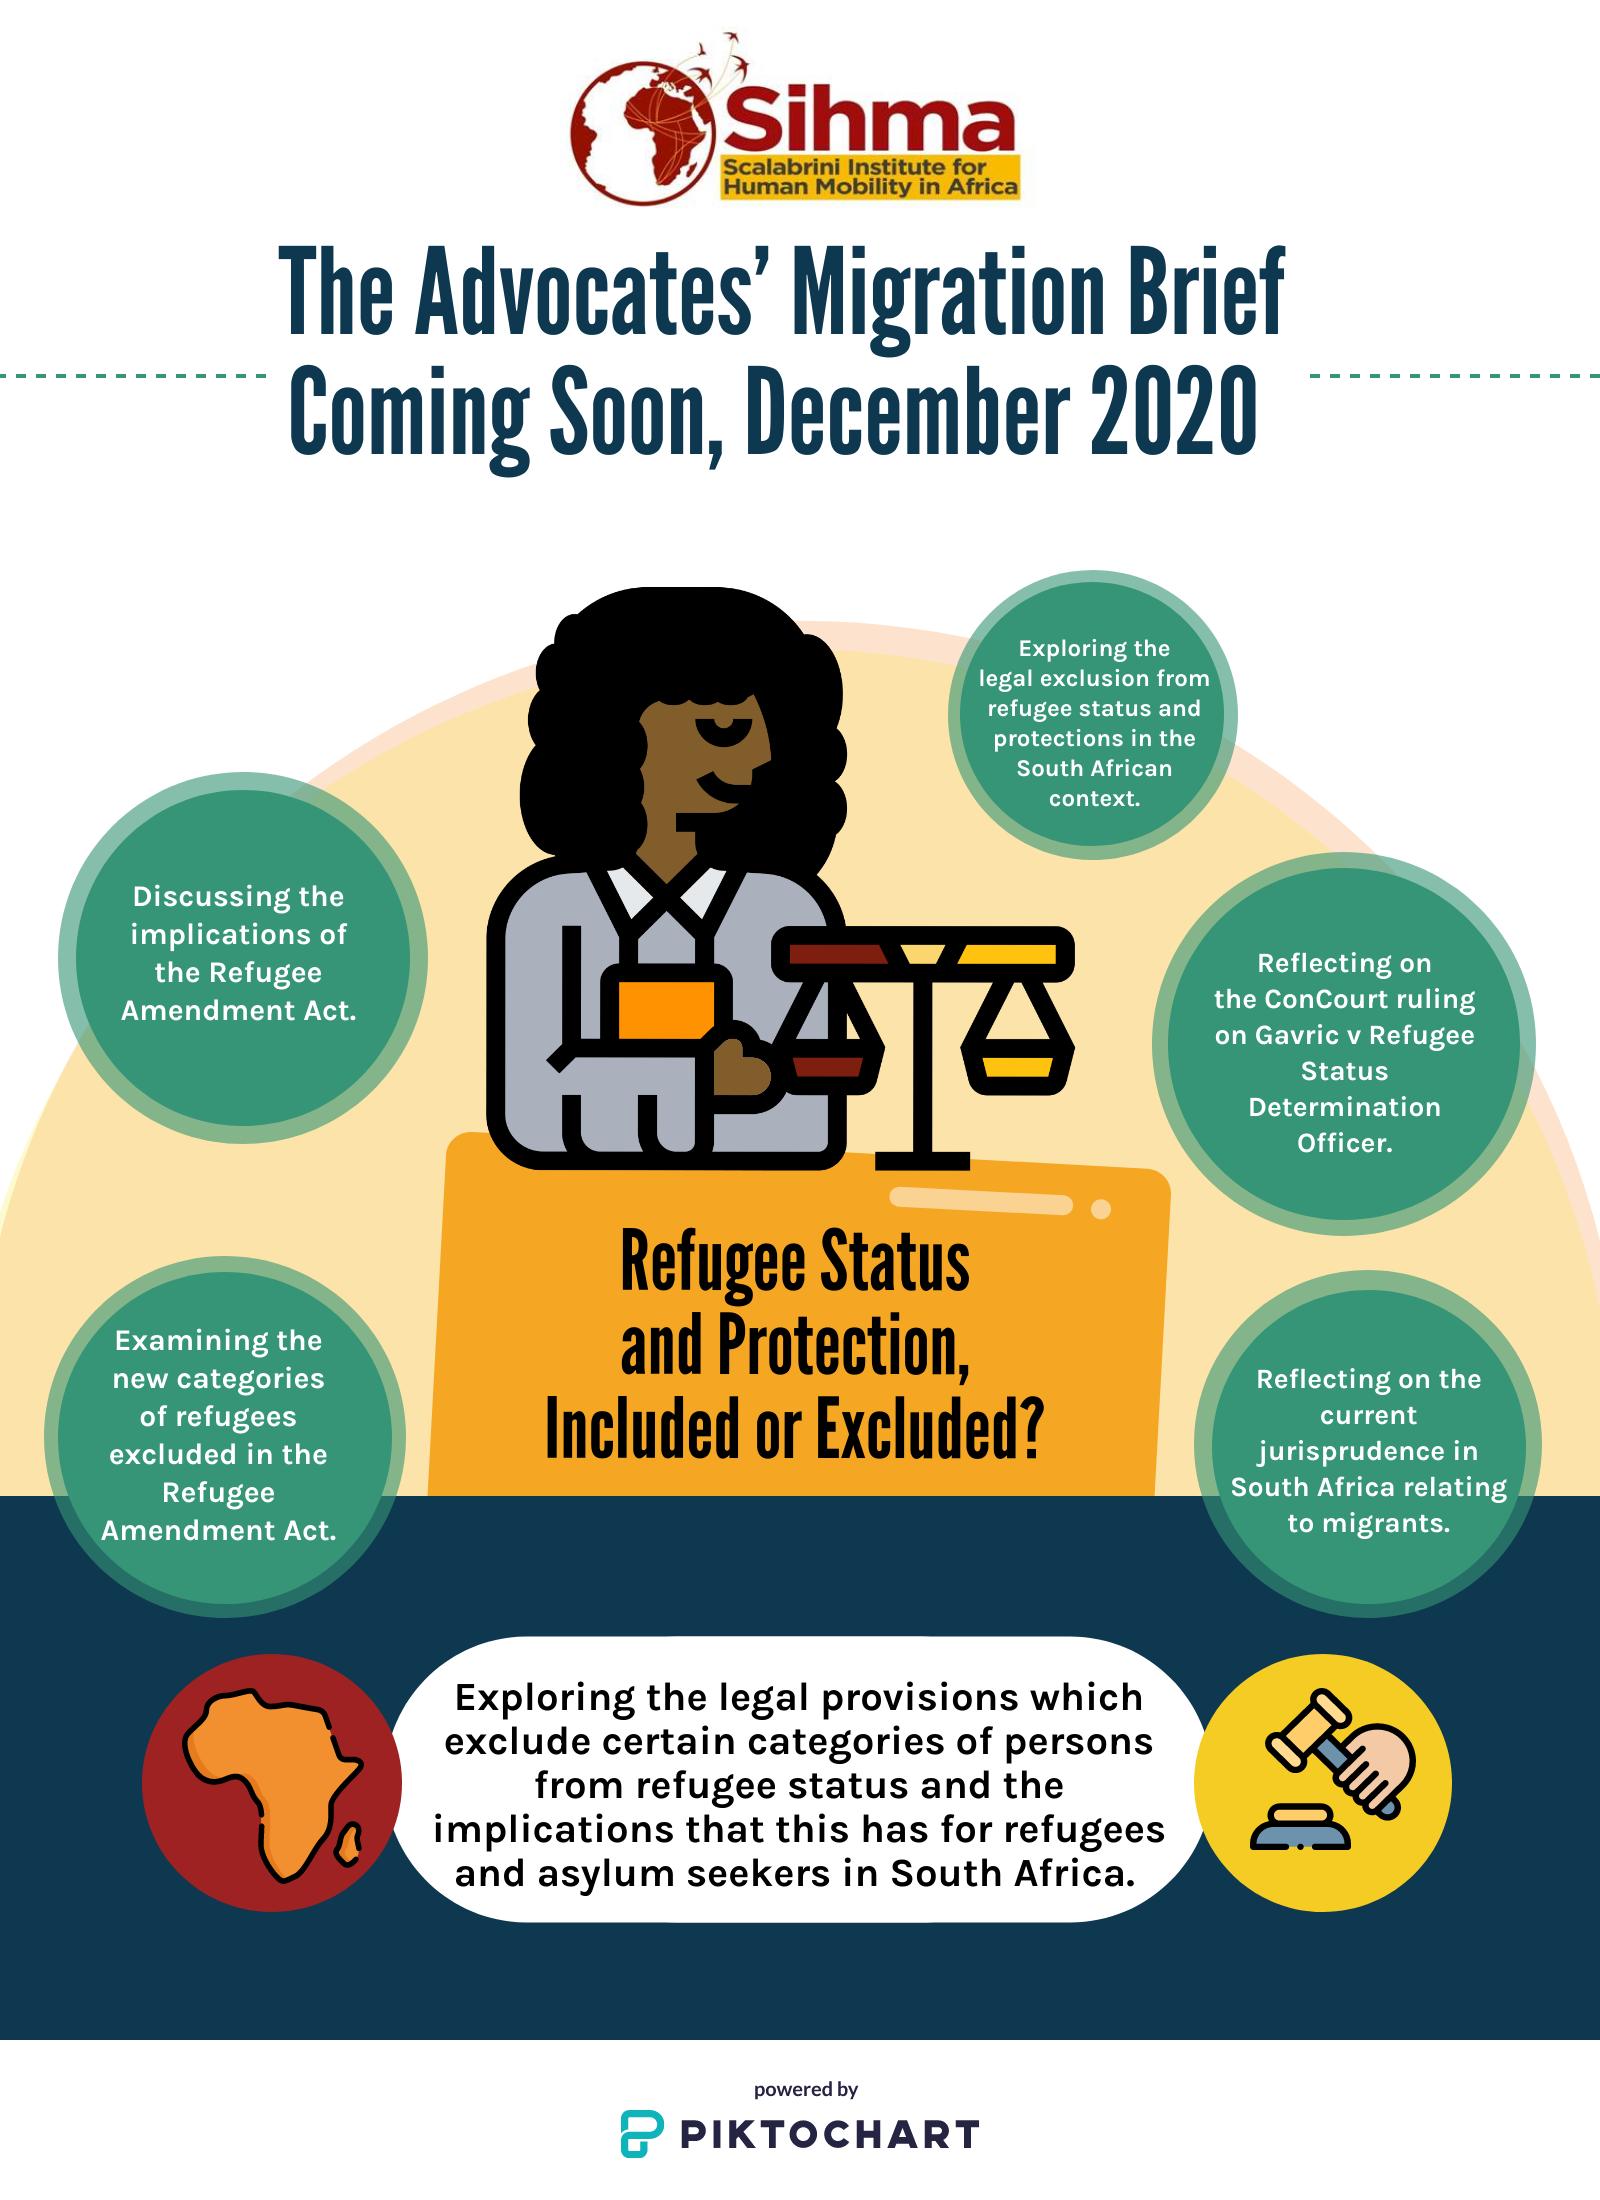 https://sihma.org.za/photos/shares/advocates-migra_.png